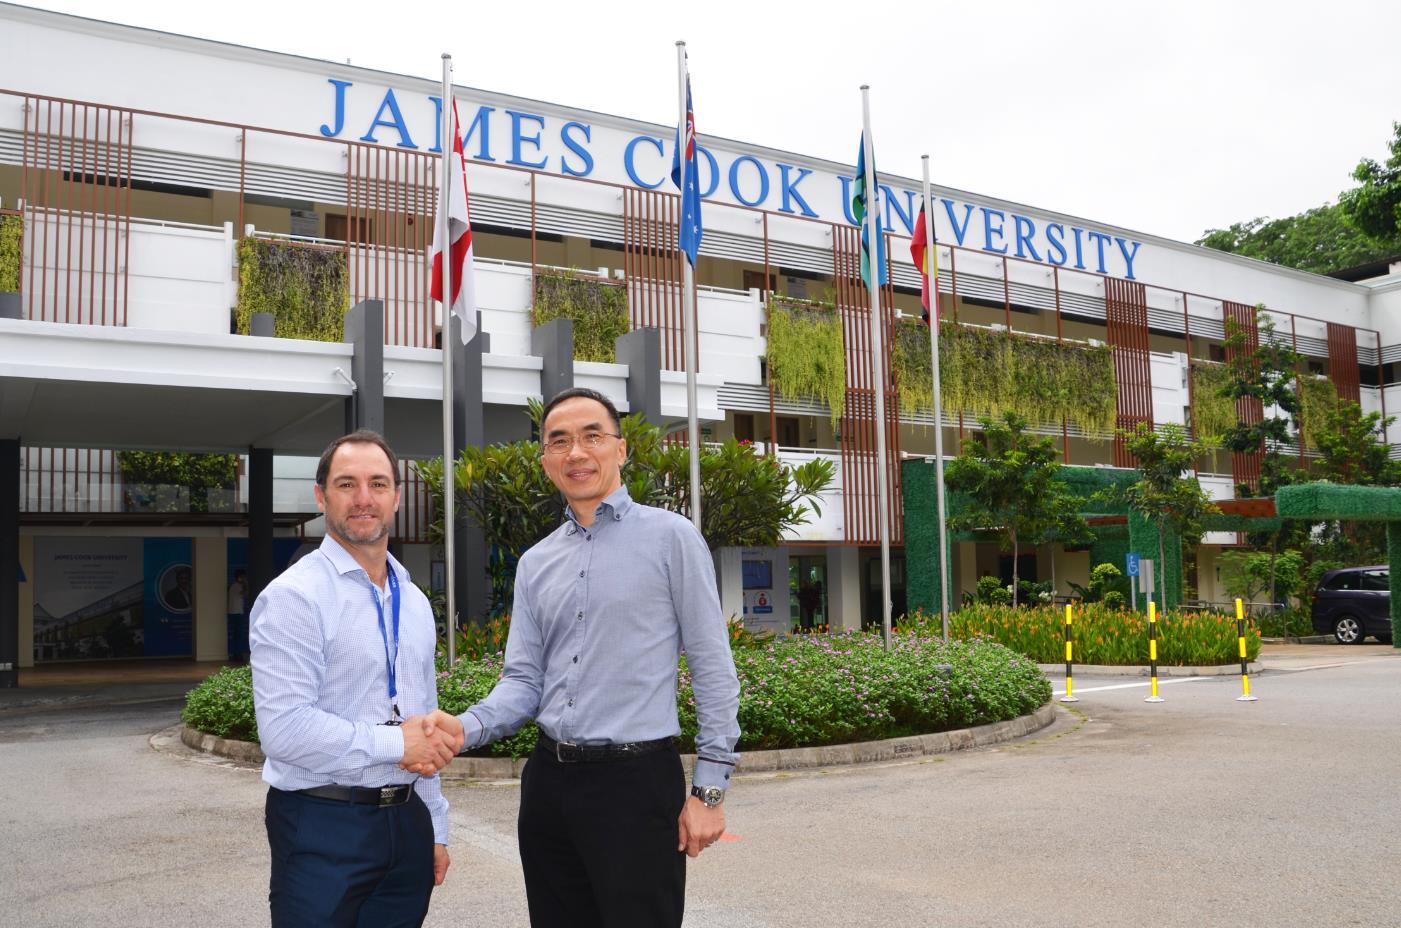 Prof Dean Jerry and Associate Professor Matthew Tan, Oceanus Tech CEO